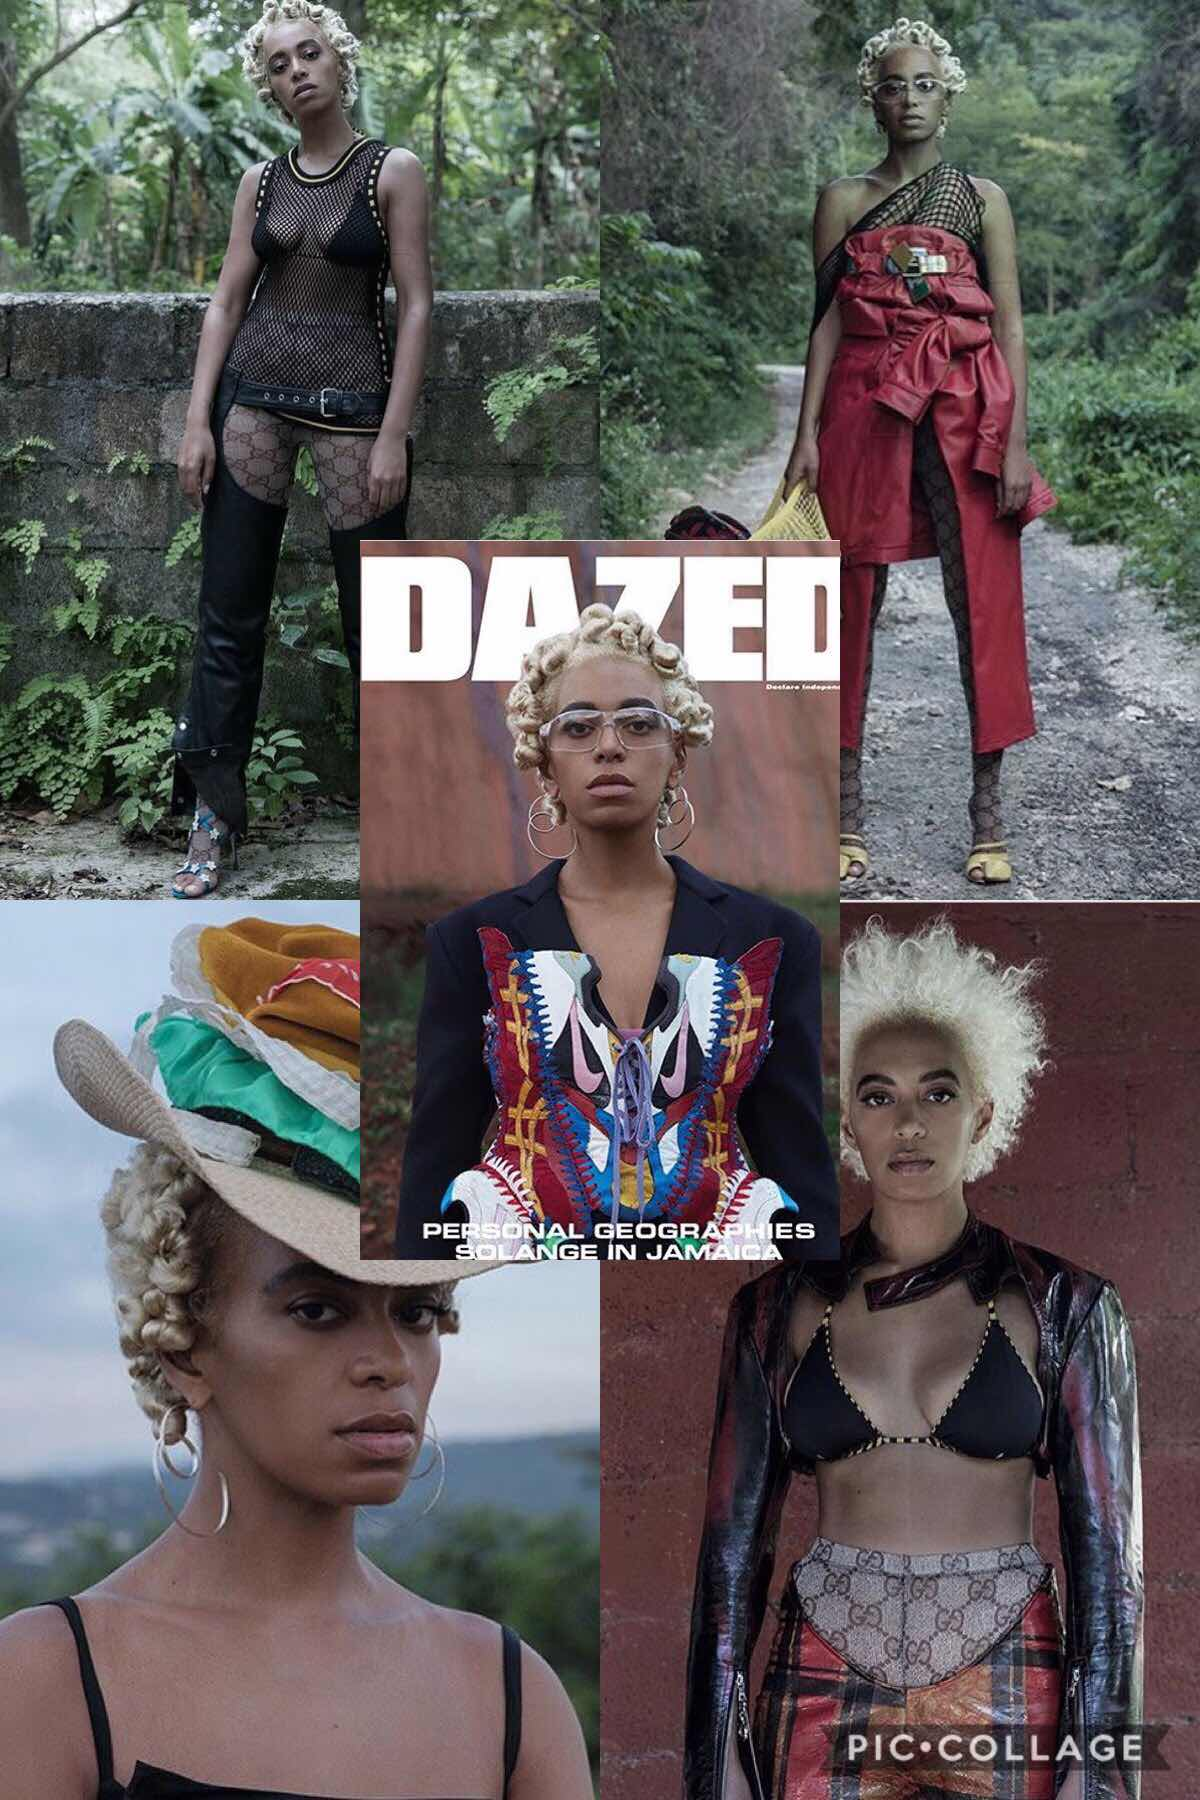 Dazed 🎯🎯Solange